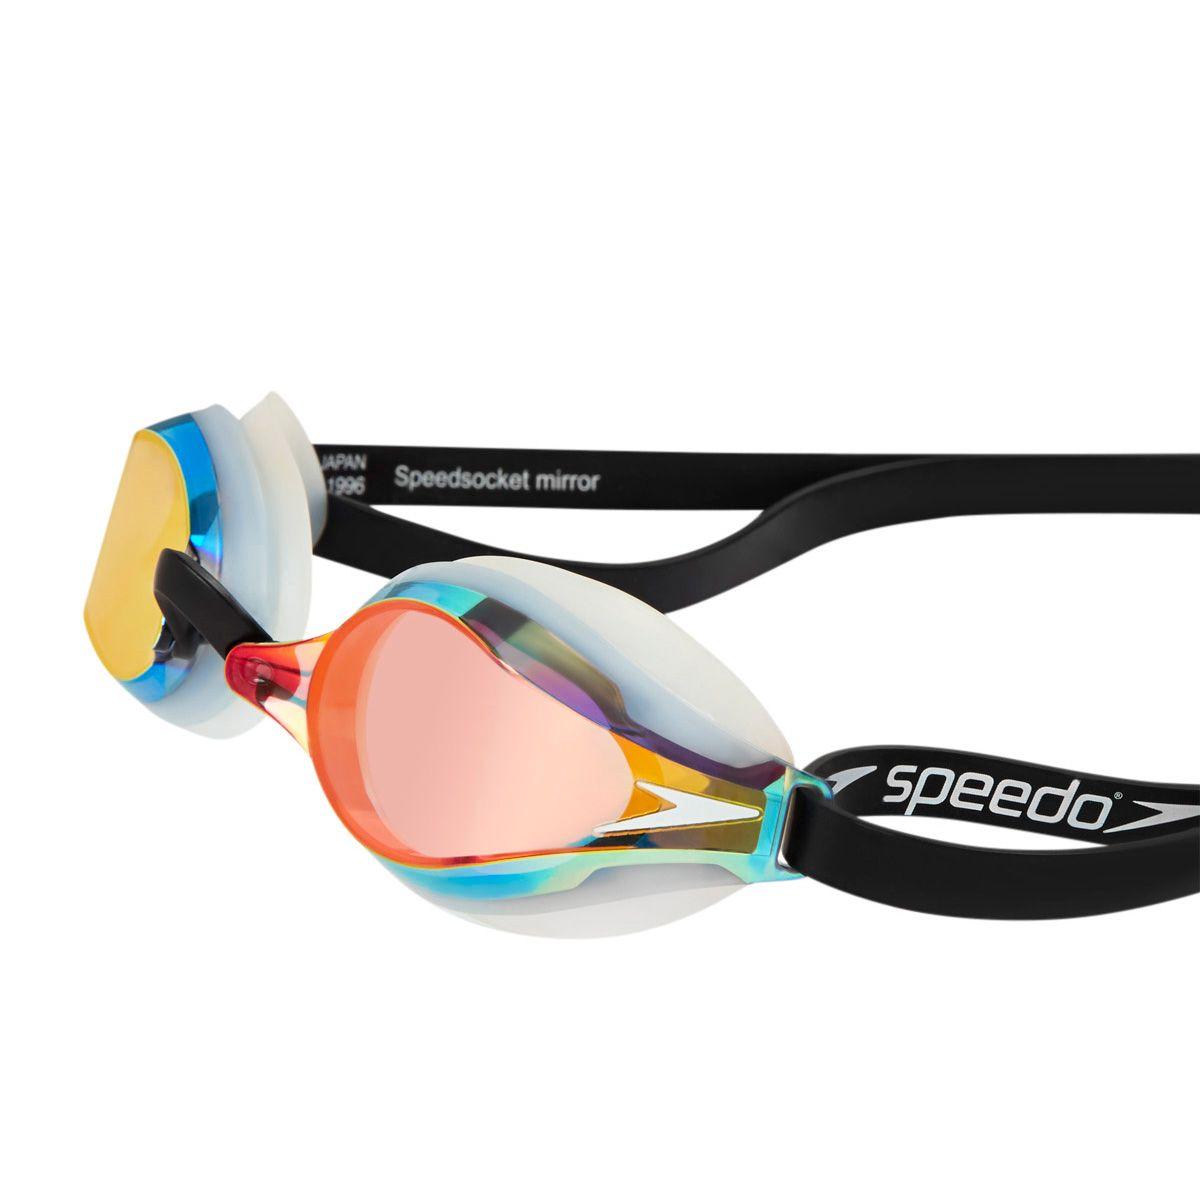 Speedo Fastskin3 Speedsocket 2 Mirrored Swimming Goggles